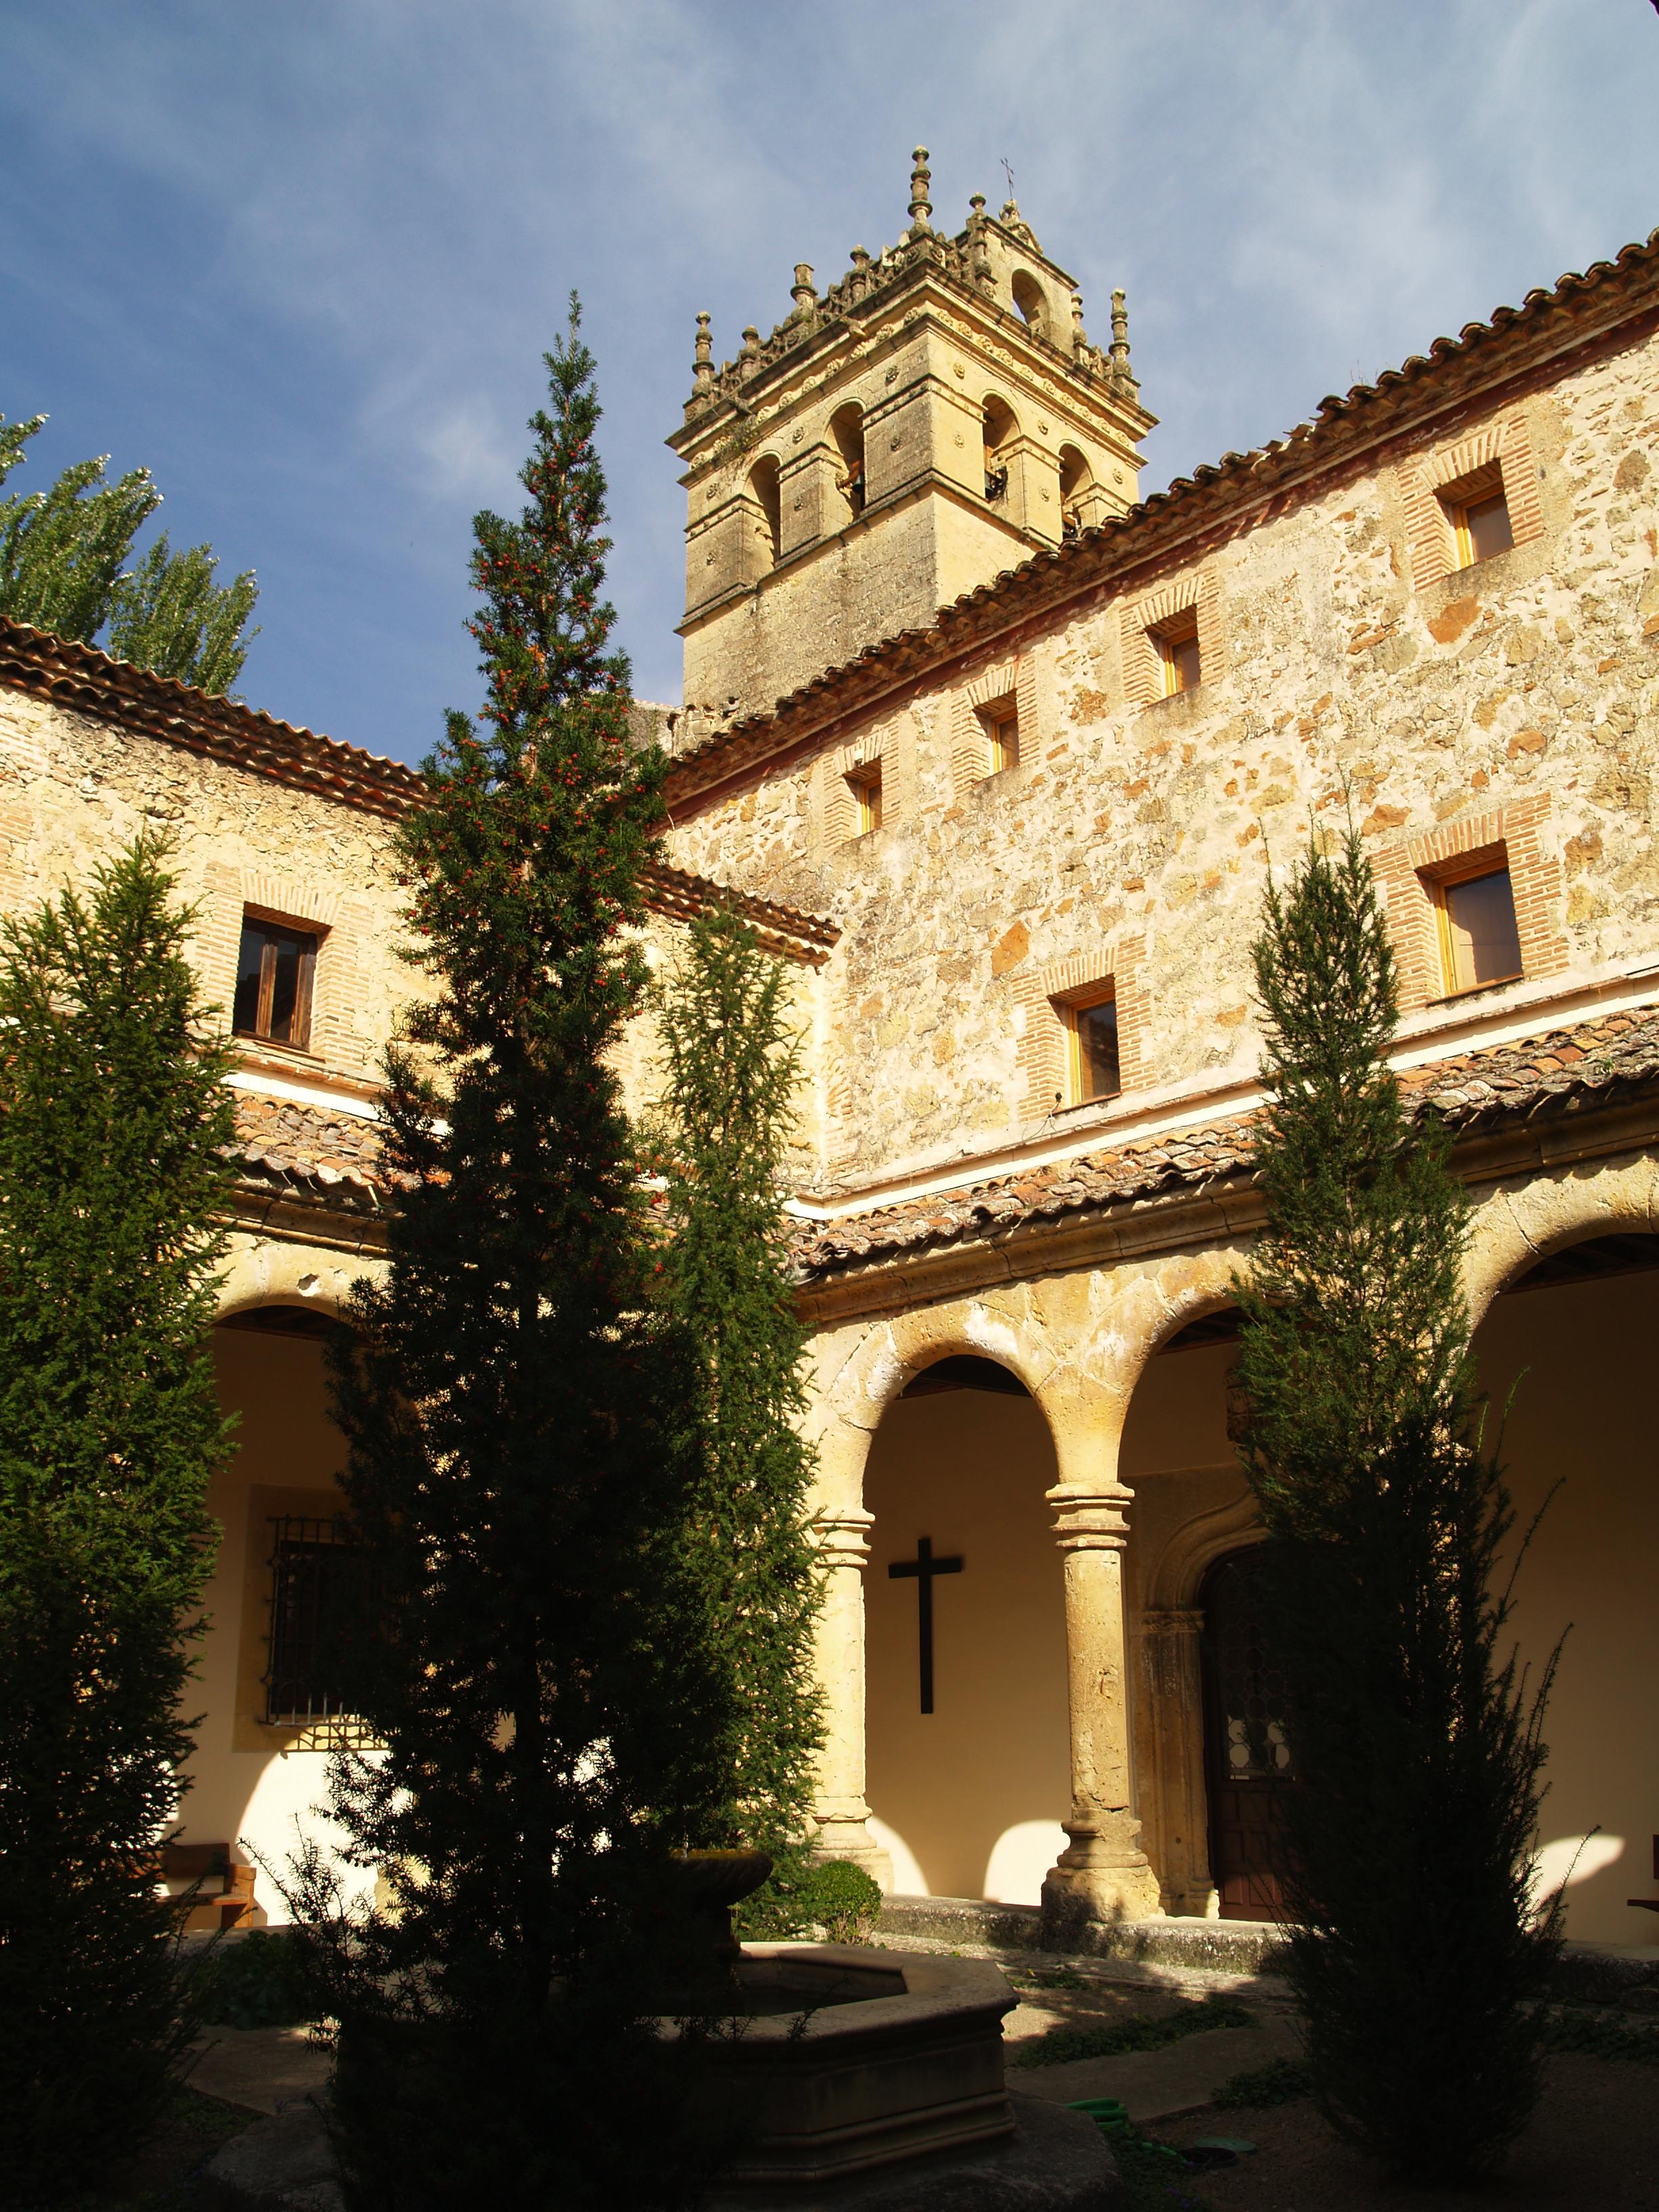 Cloister of El Parral Monastery. Photo by Miguel Hermoso Cuesta